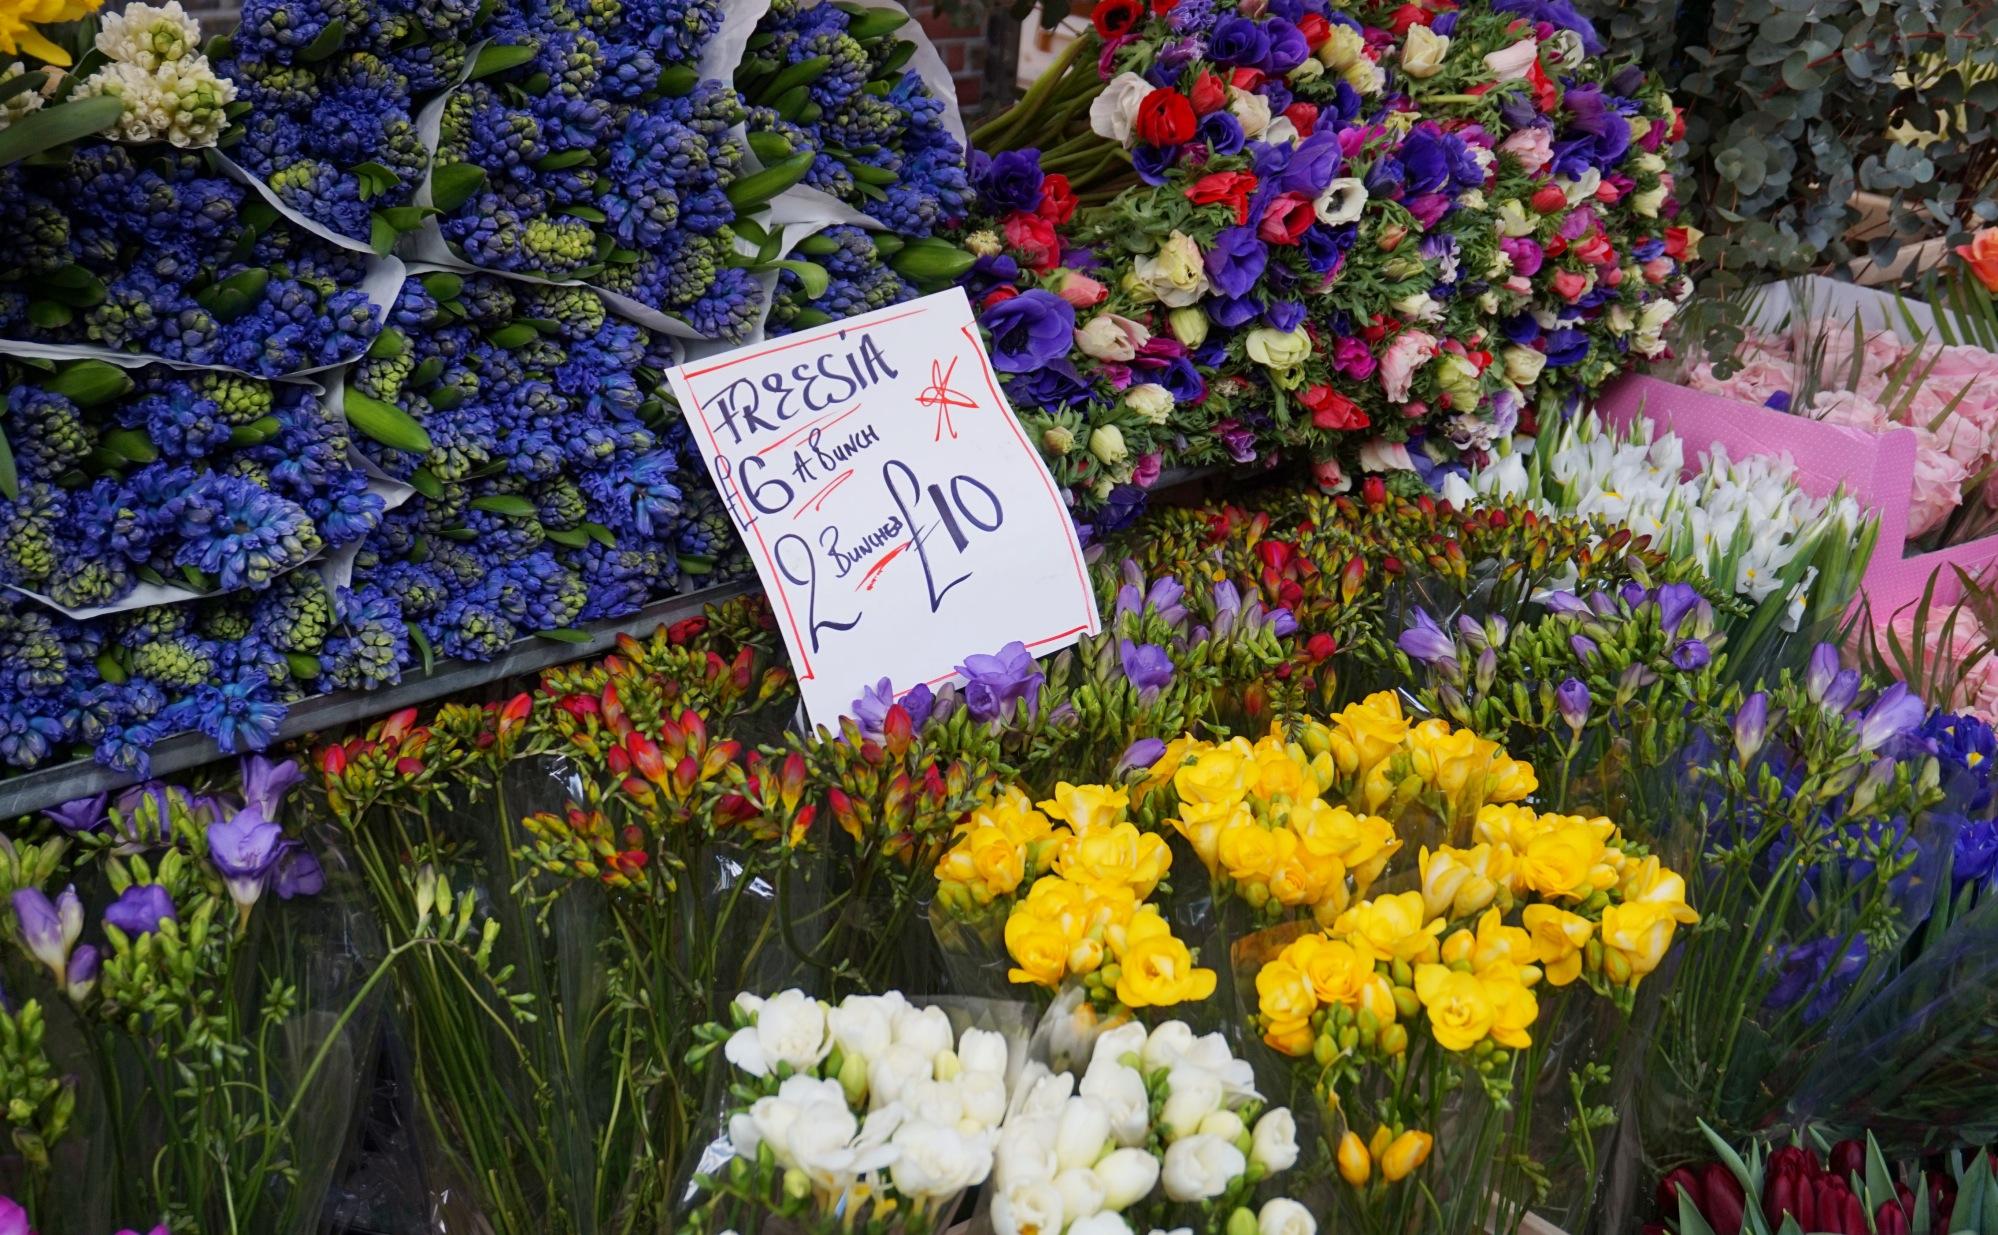 Balade-Columbia-Road-Flower-Market-11